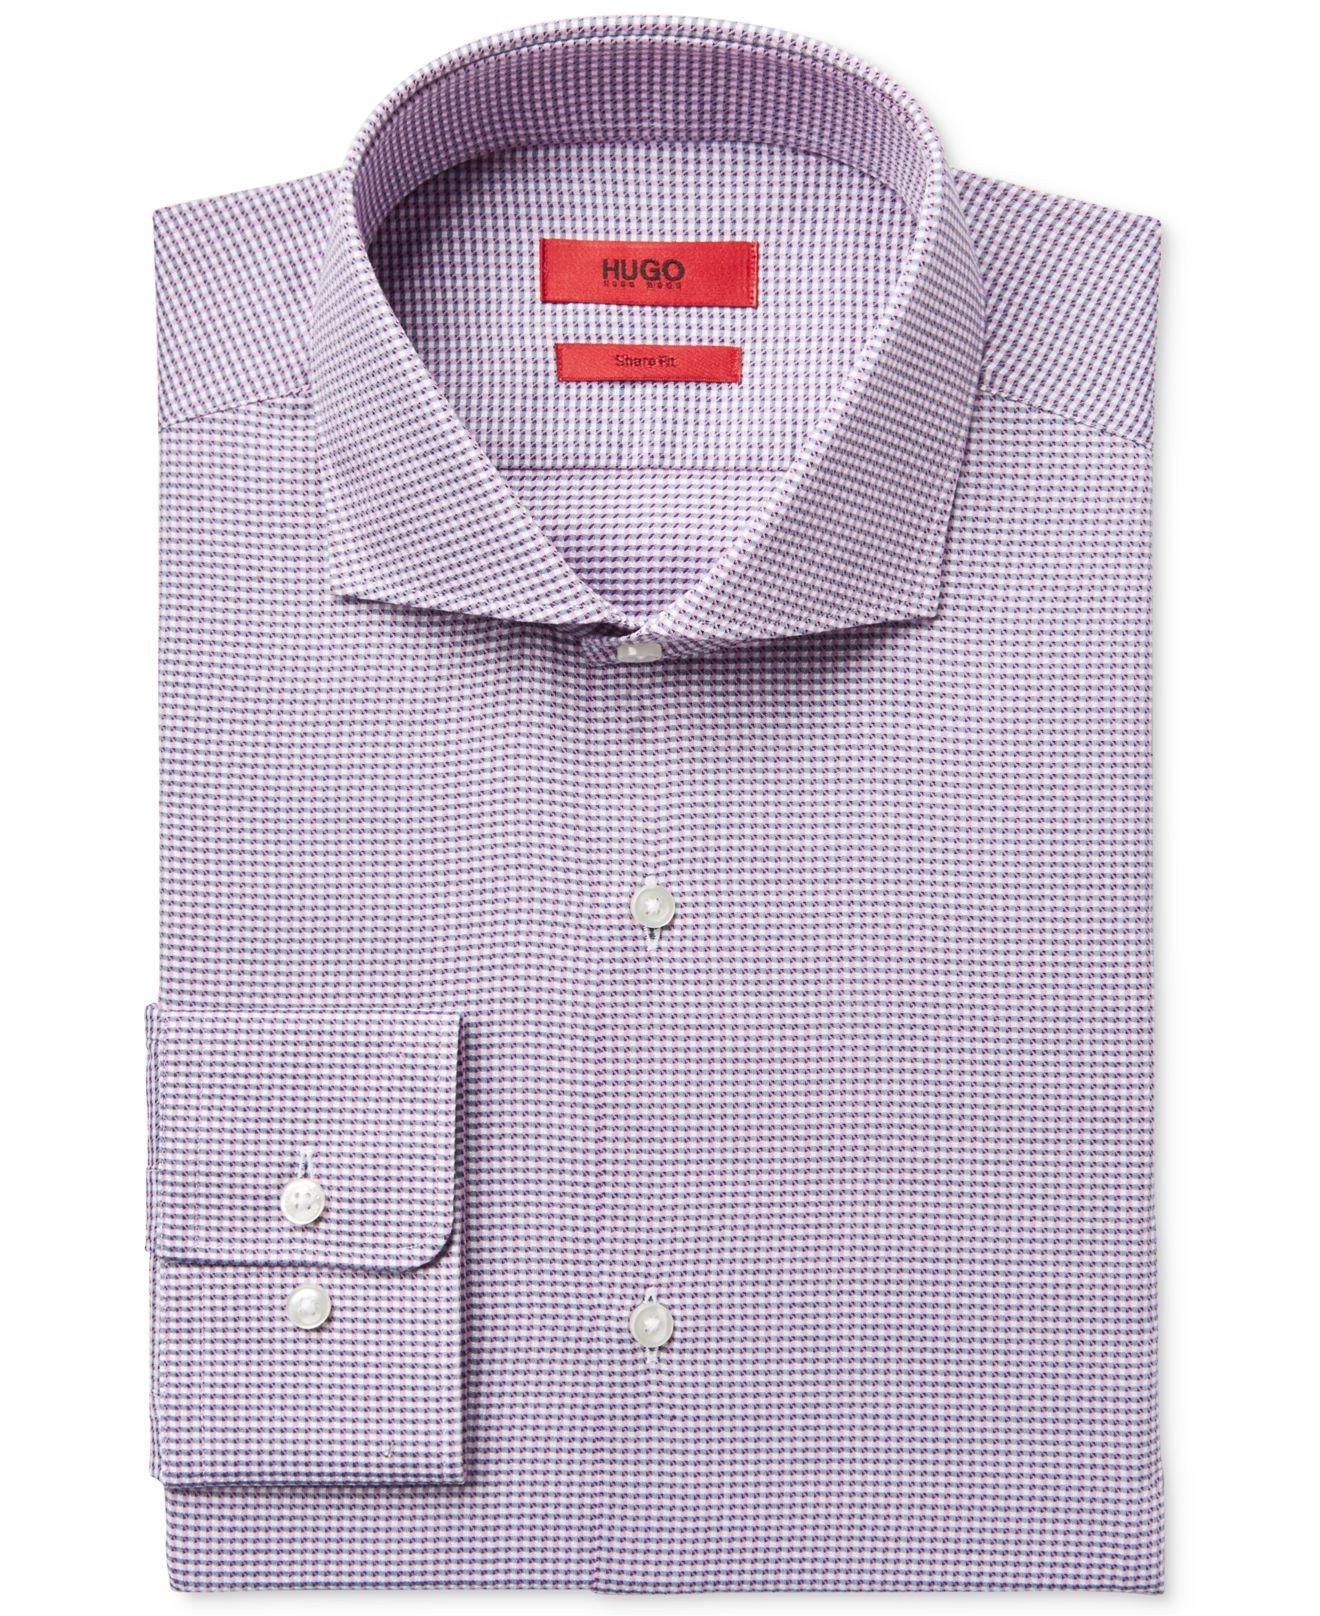 Boss hugo men 39 s slim fit pink micro pattern dress shirt in for Hugo boss slim fit dress shirt